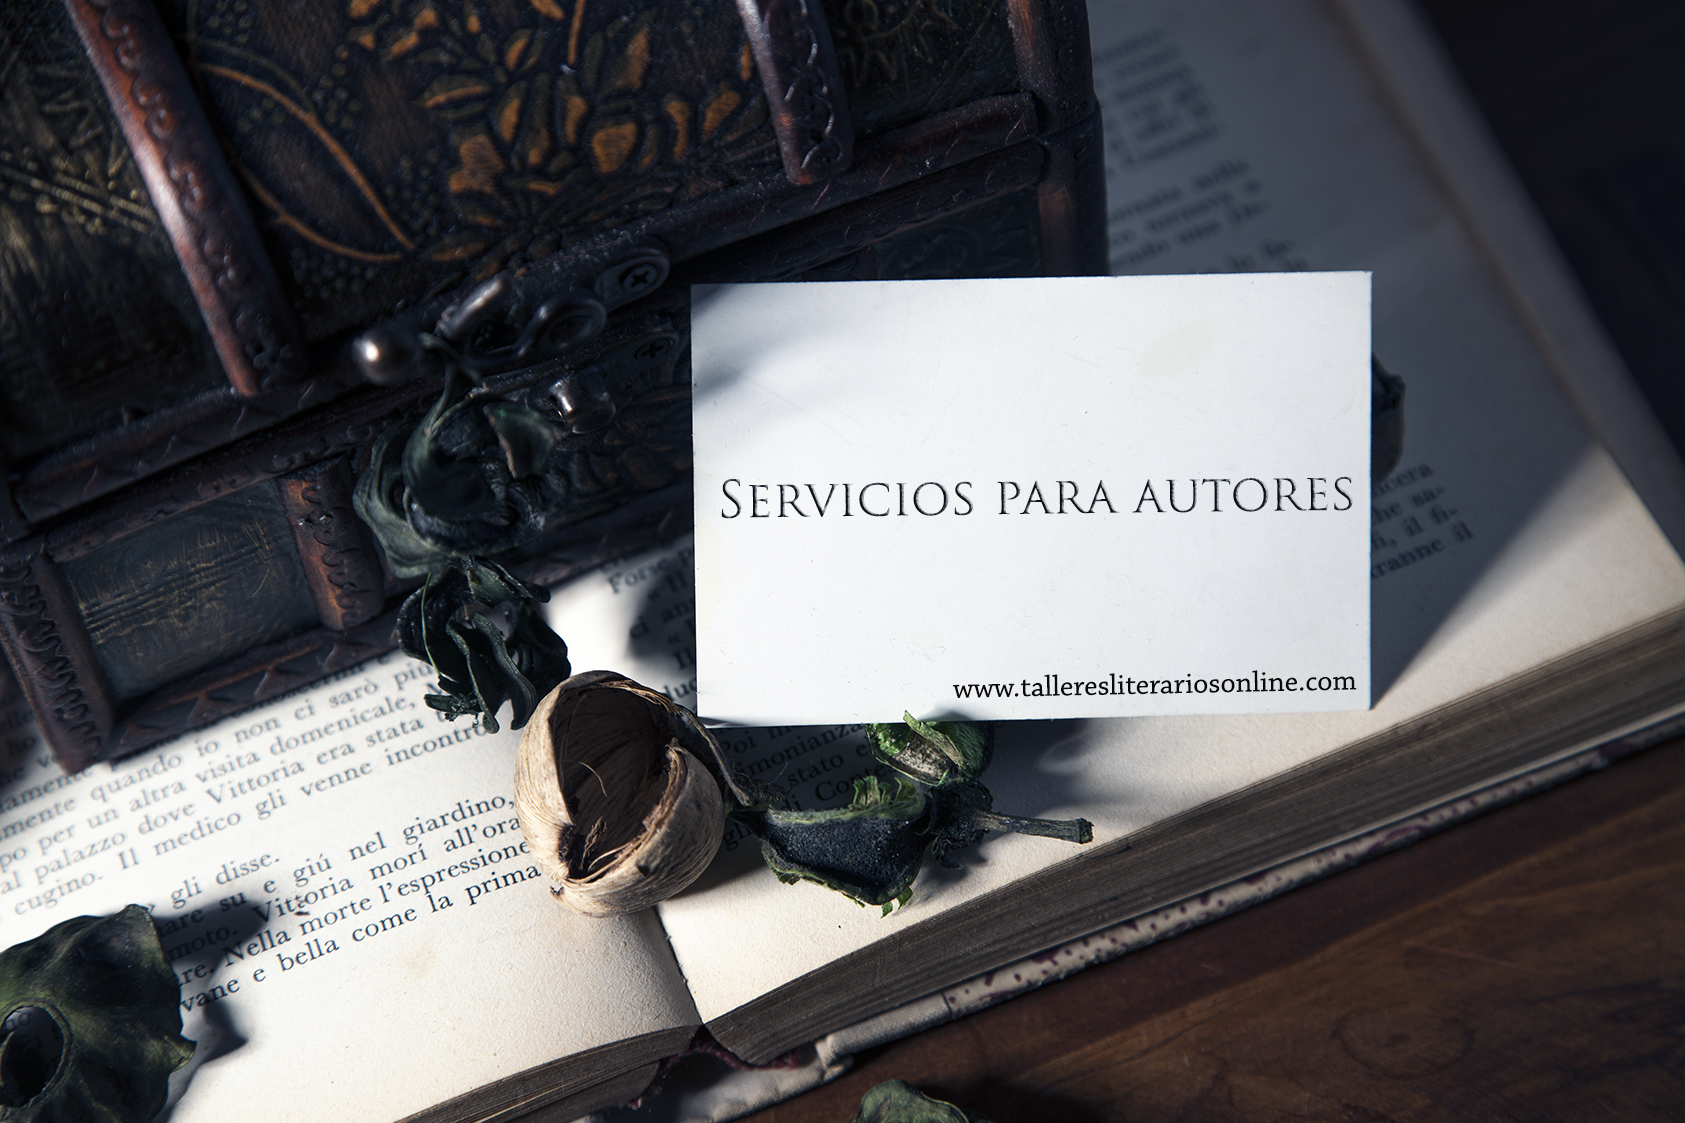 Servicios para autores | Talleres Literarios Online